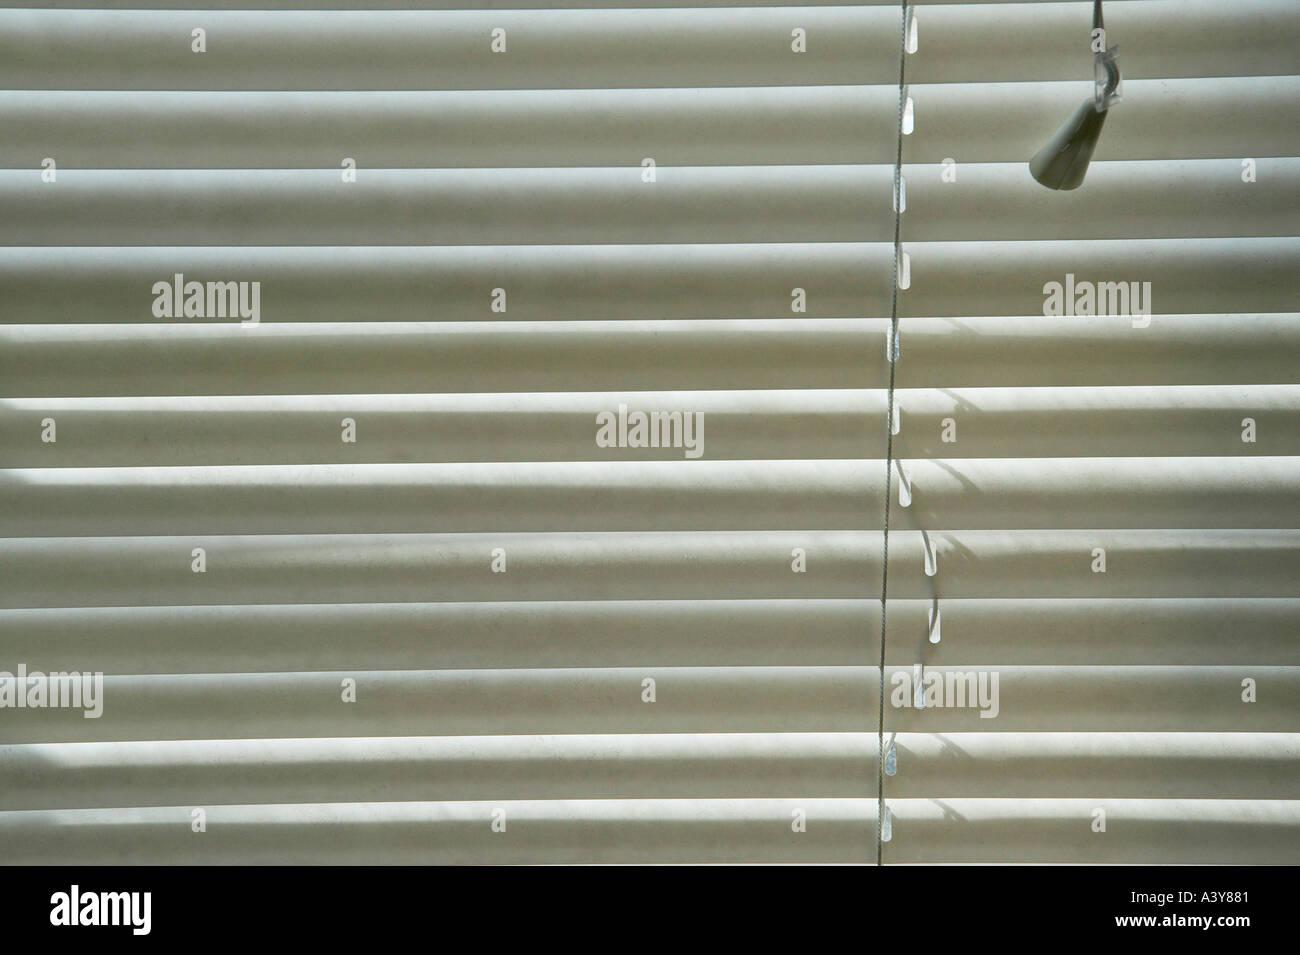 white plastic venetian blinds on window stock photo. Black Bedroom Furniture Sets. Home Design Ideas